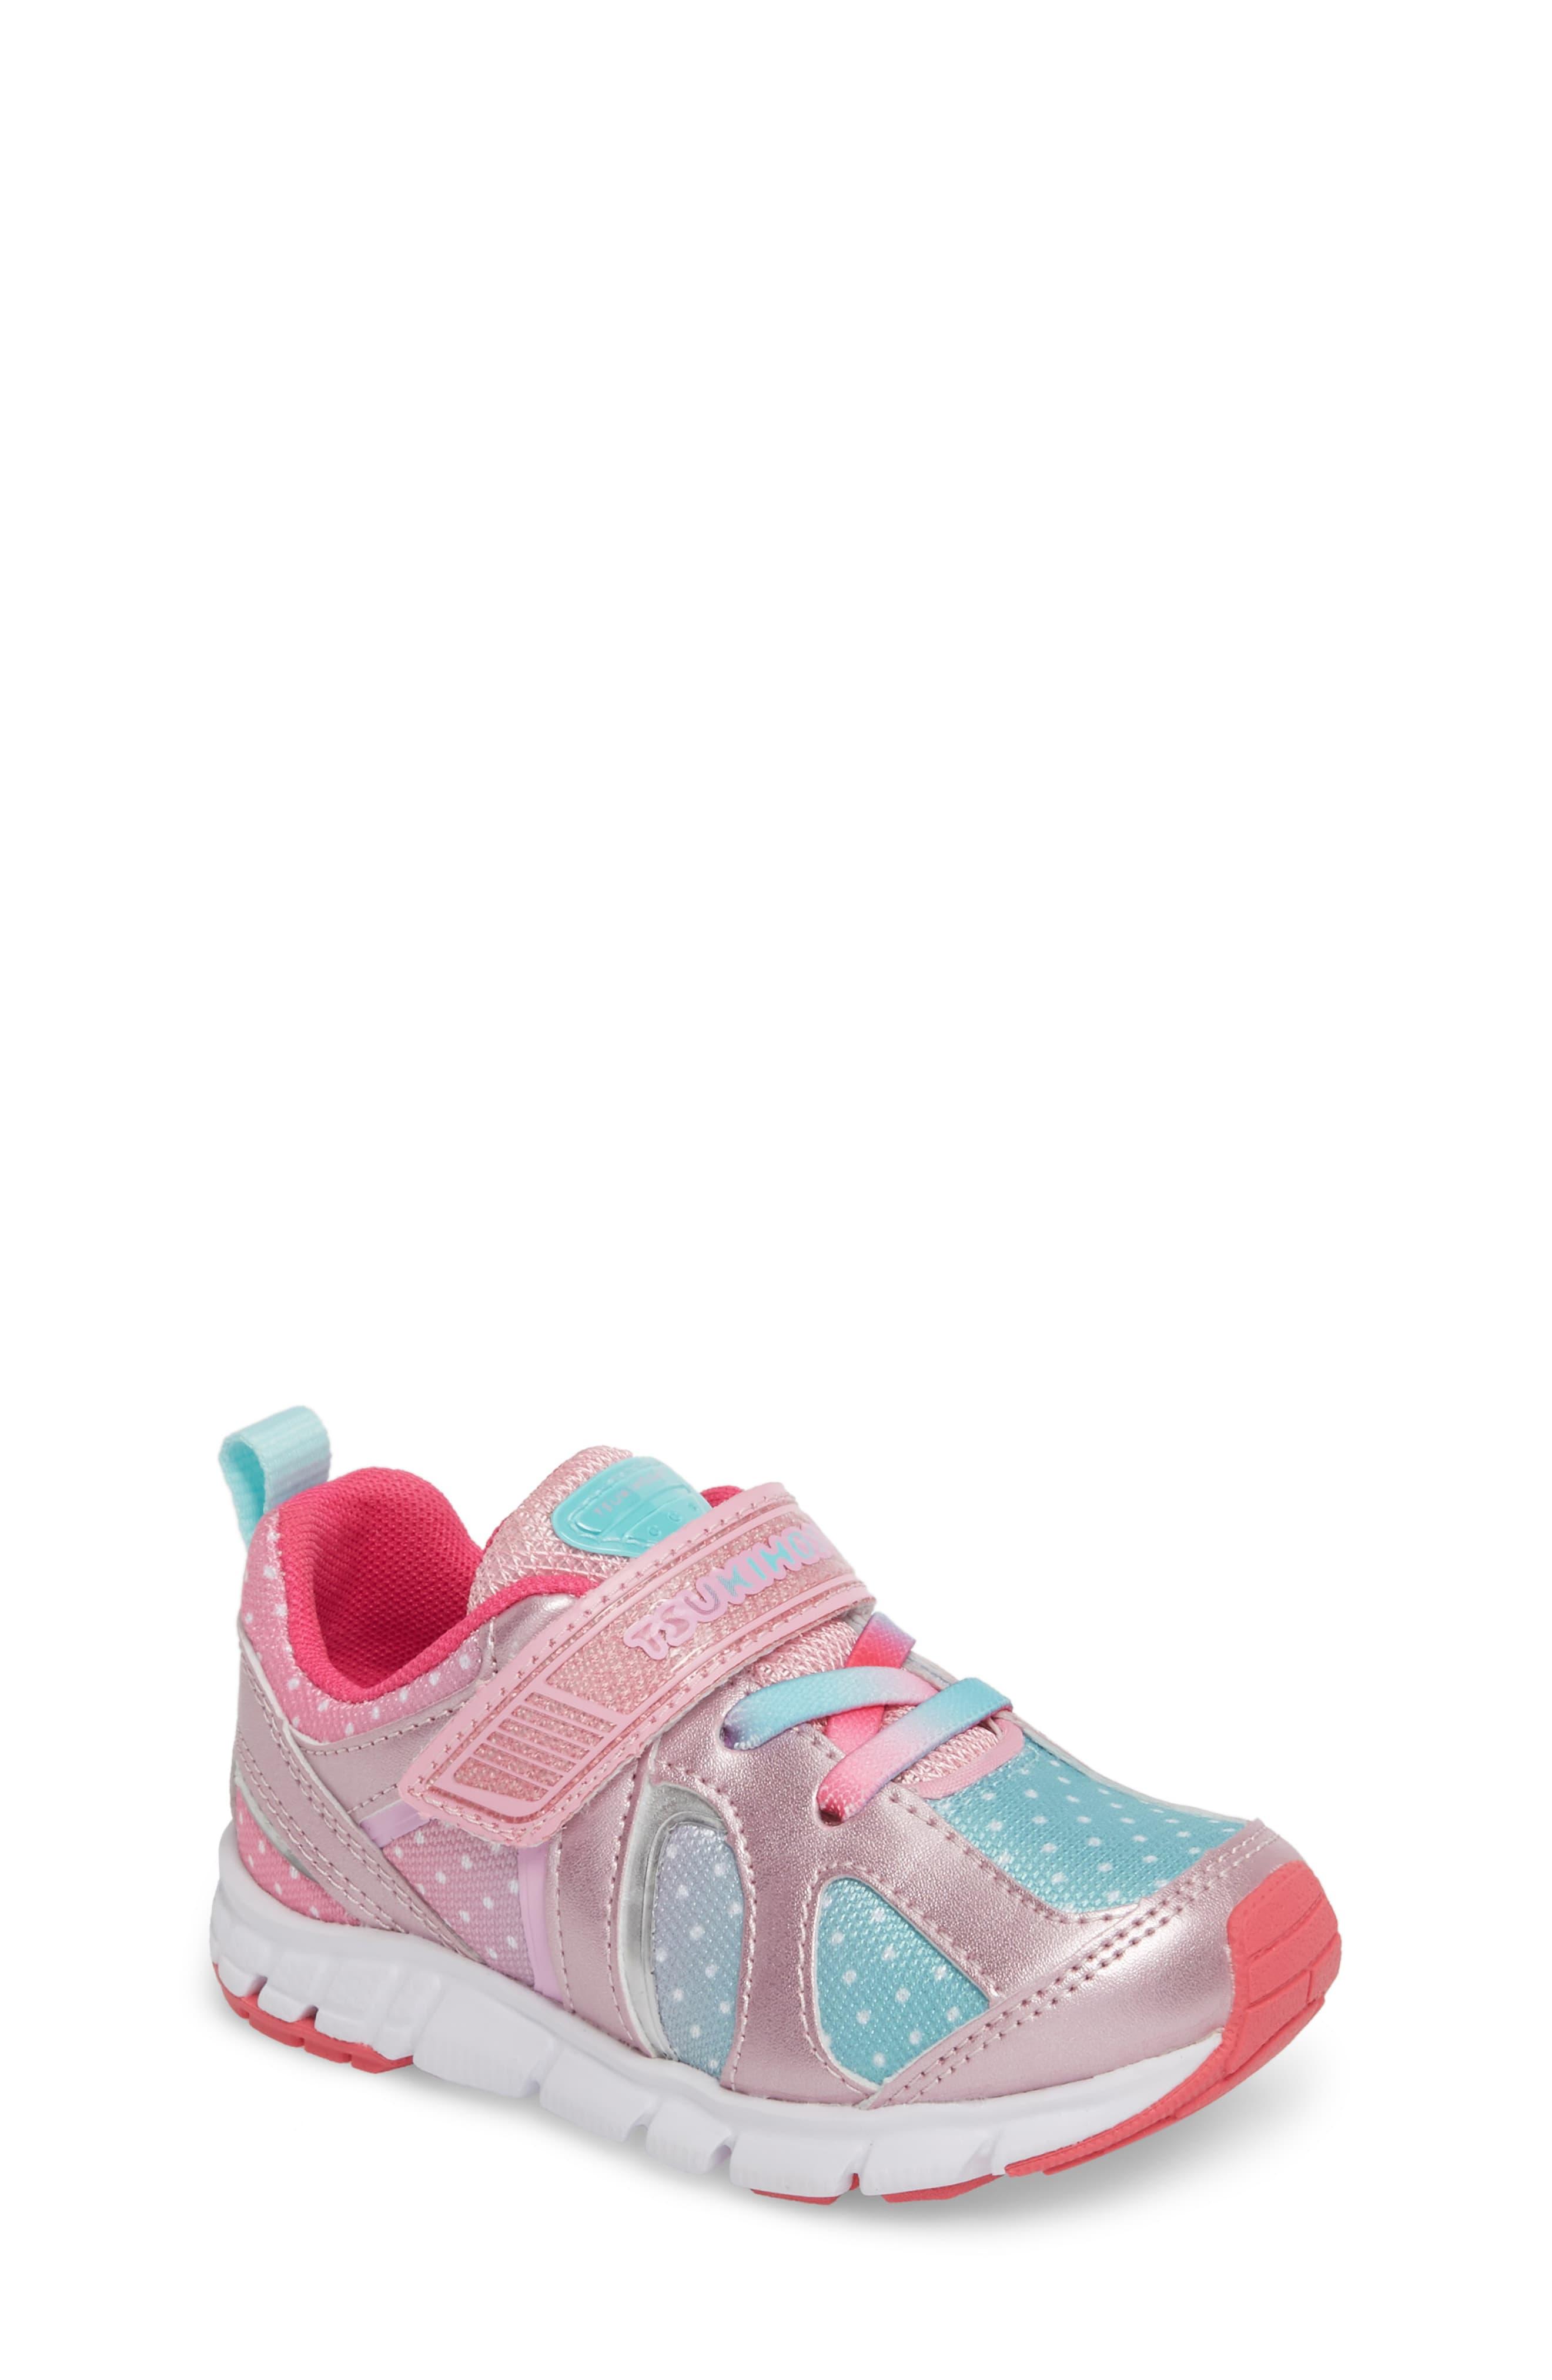 Tsukihoshi Rainbow Washable Sneaker Walker Toddler Little Kid Big Kid Nordstrom Girls Sneakers Sneakers Toddler Girl